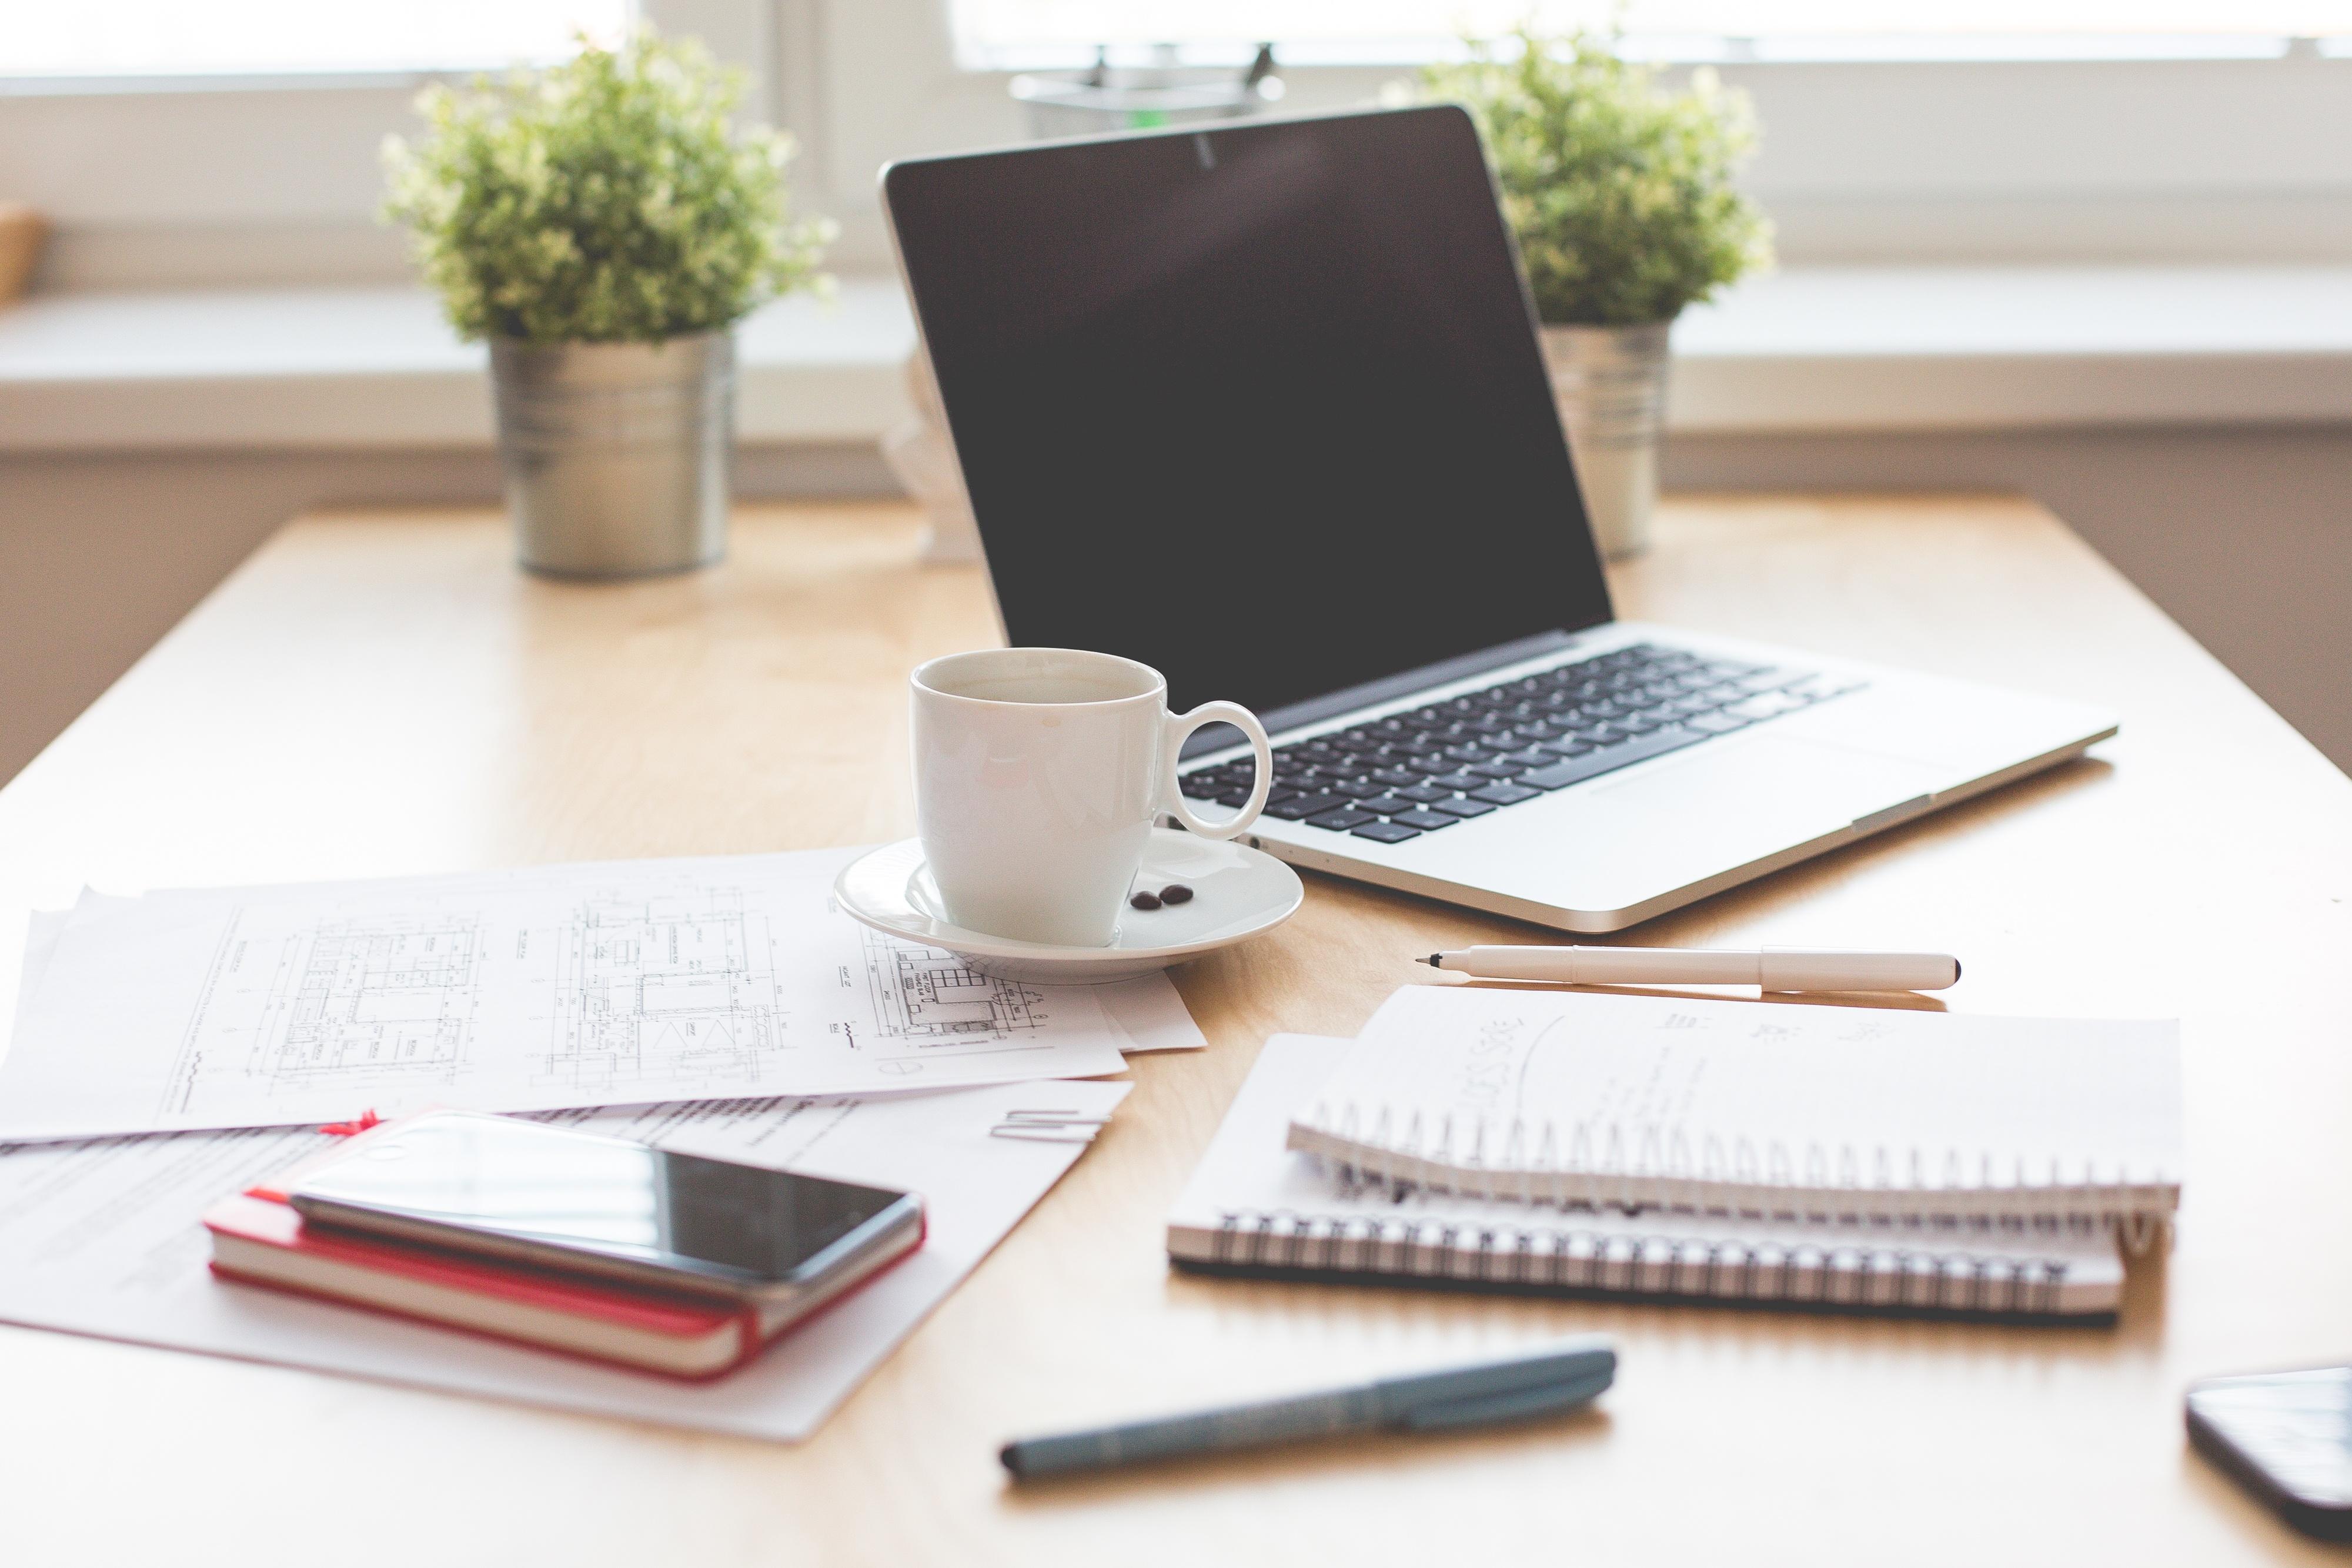 officeconference-room-workspace-picjumbo-com.jpg